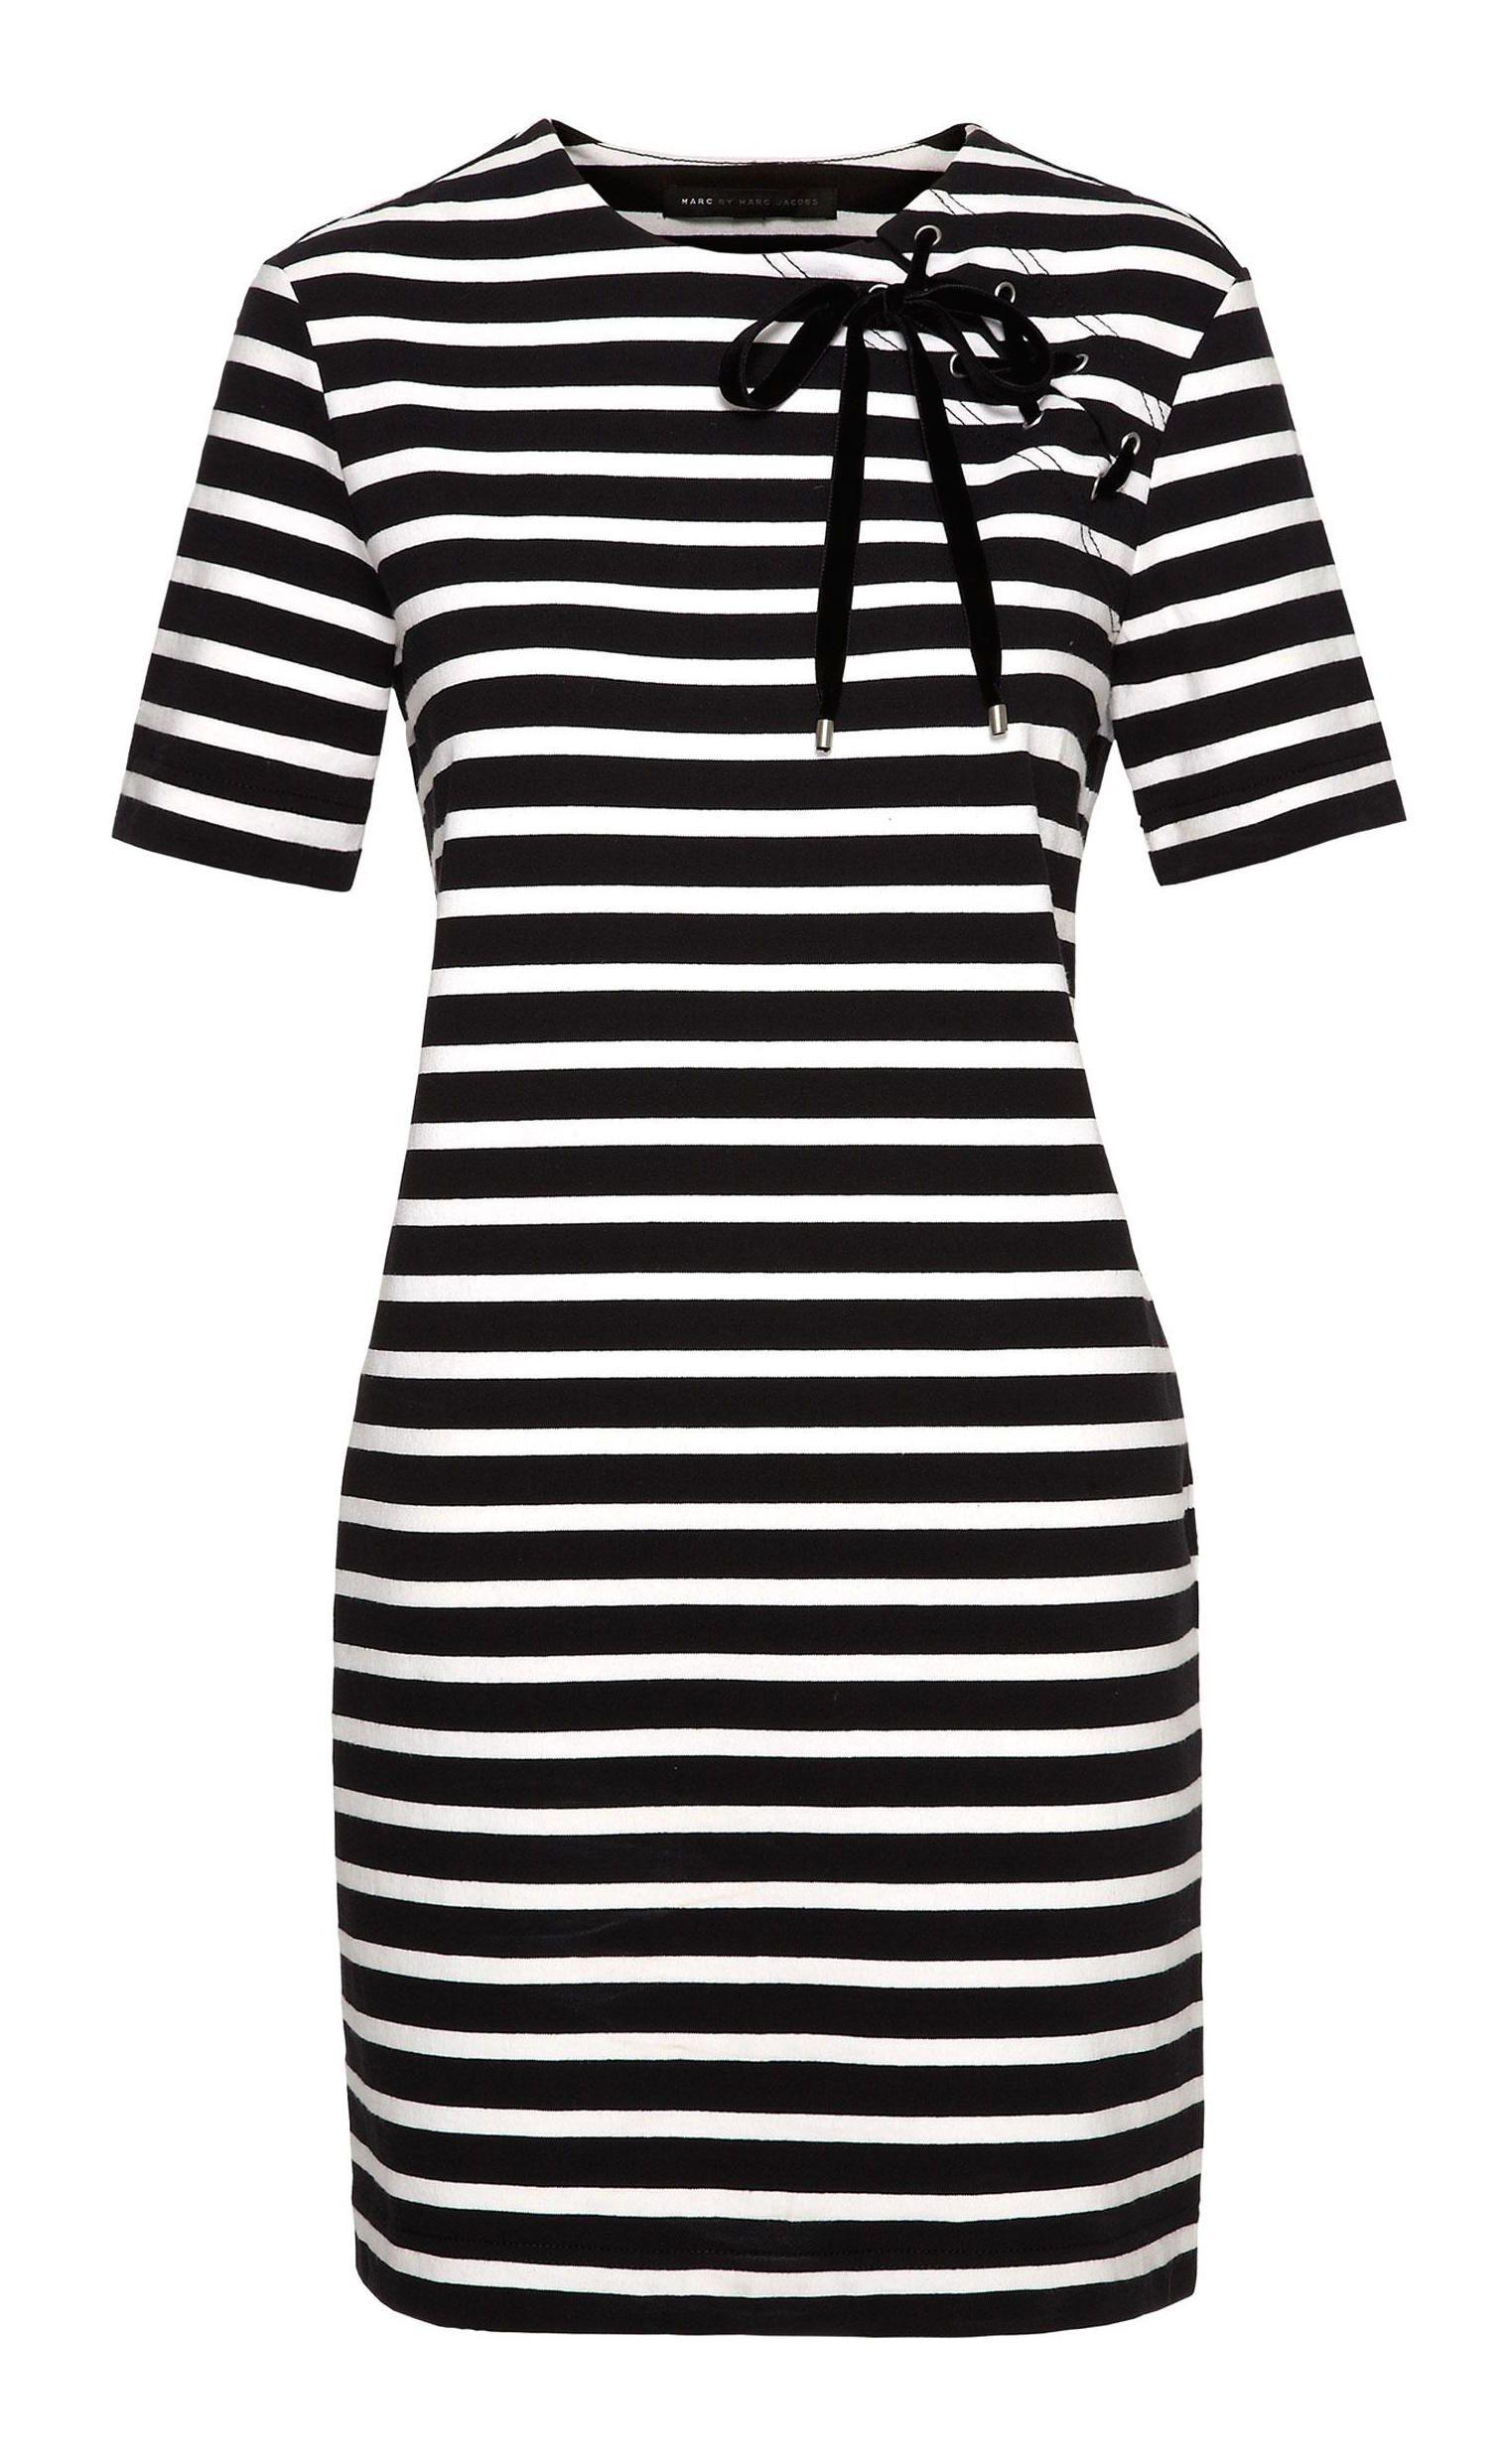 Marc by Marc Jacobs Jacquelyn Stripe Dress in Black Multi